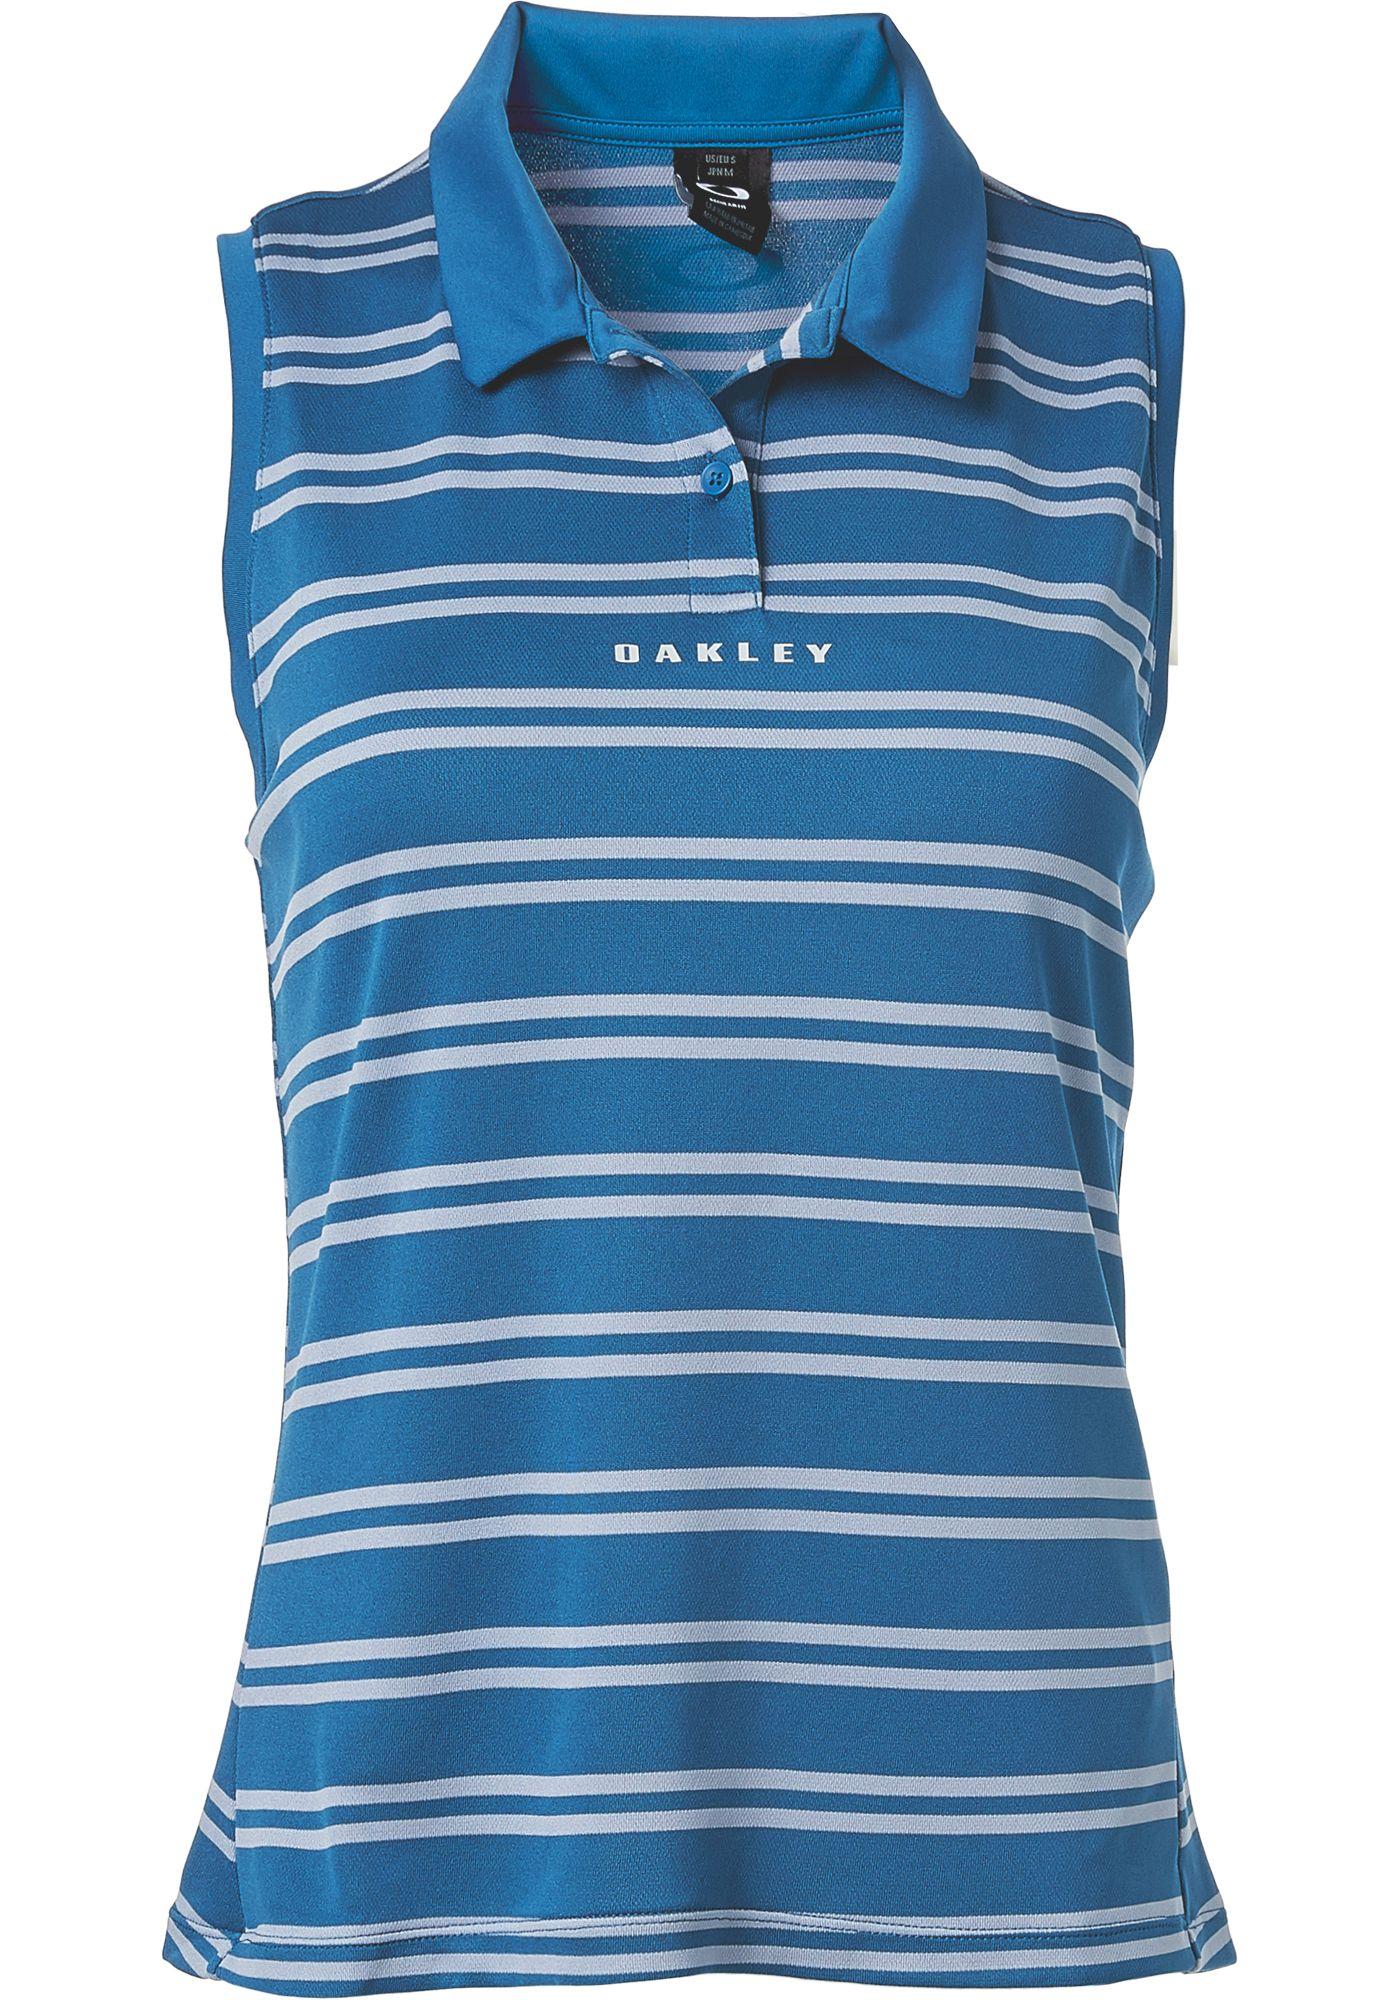 Oakley Women's Enjoy Stripe Sleeveless Golf Polo